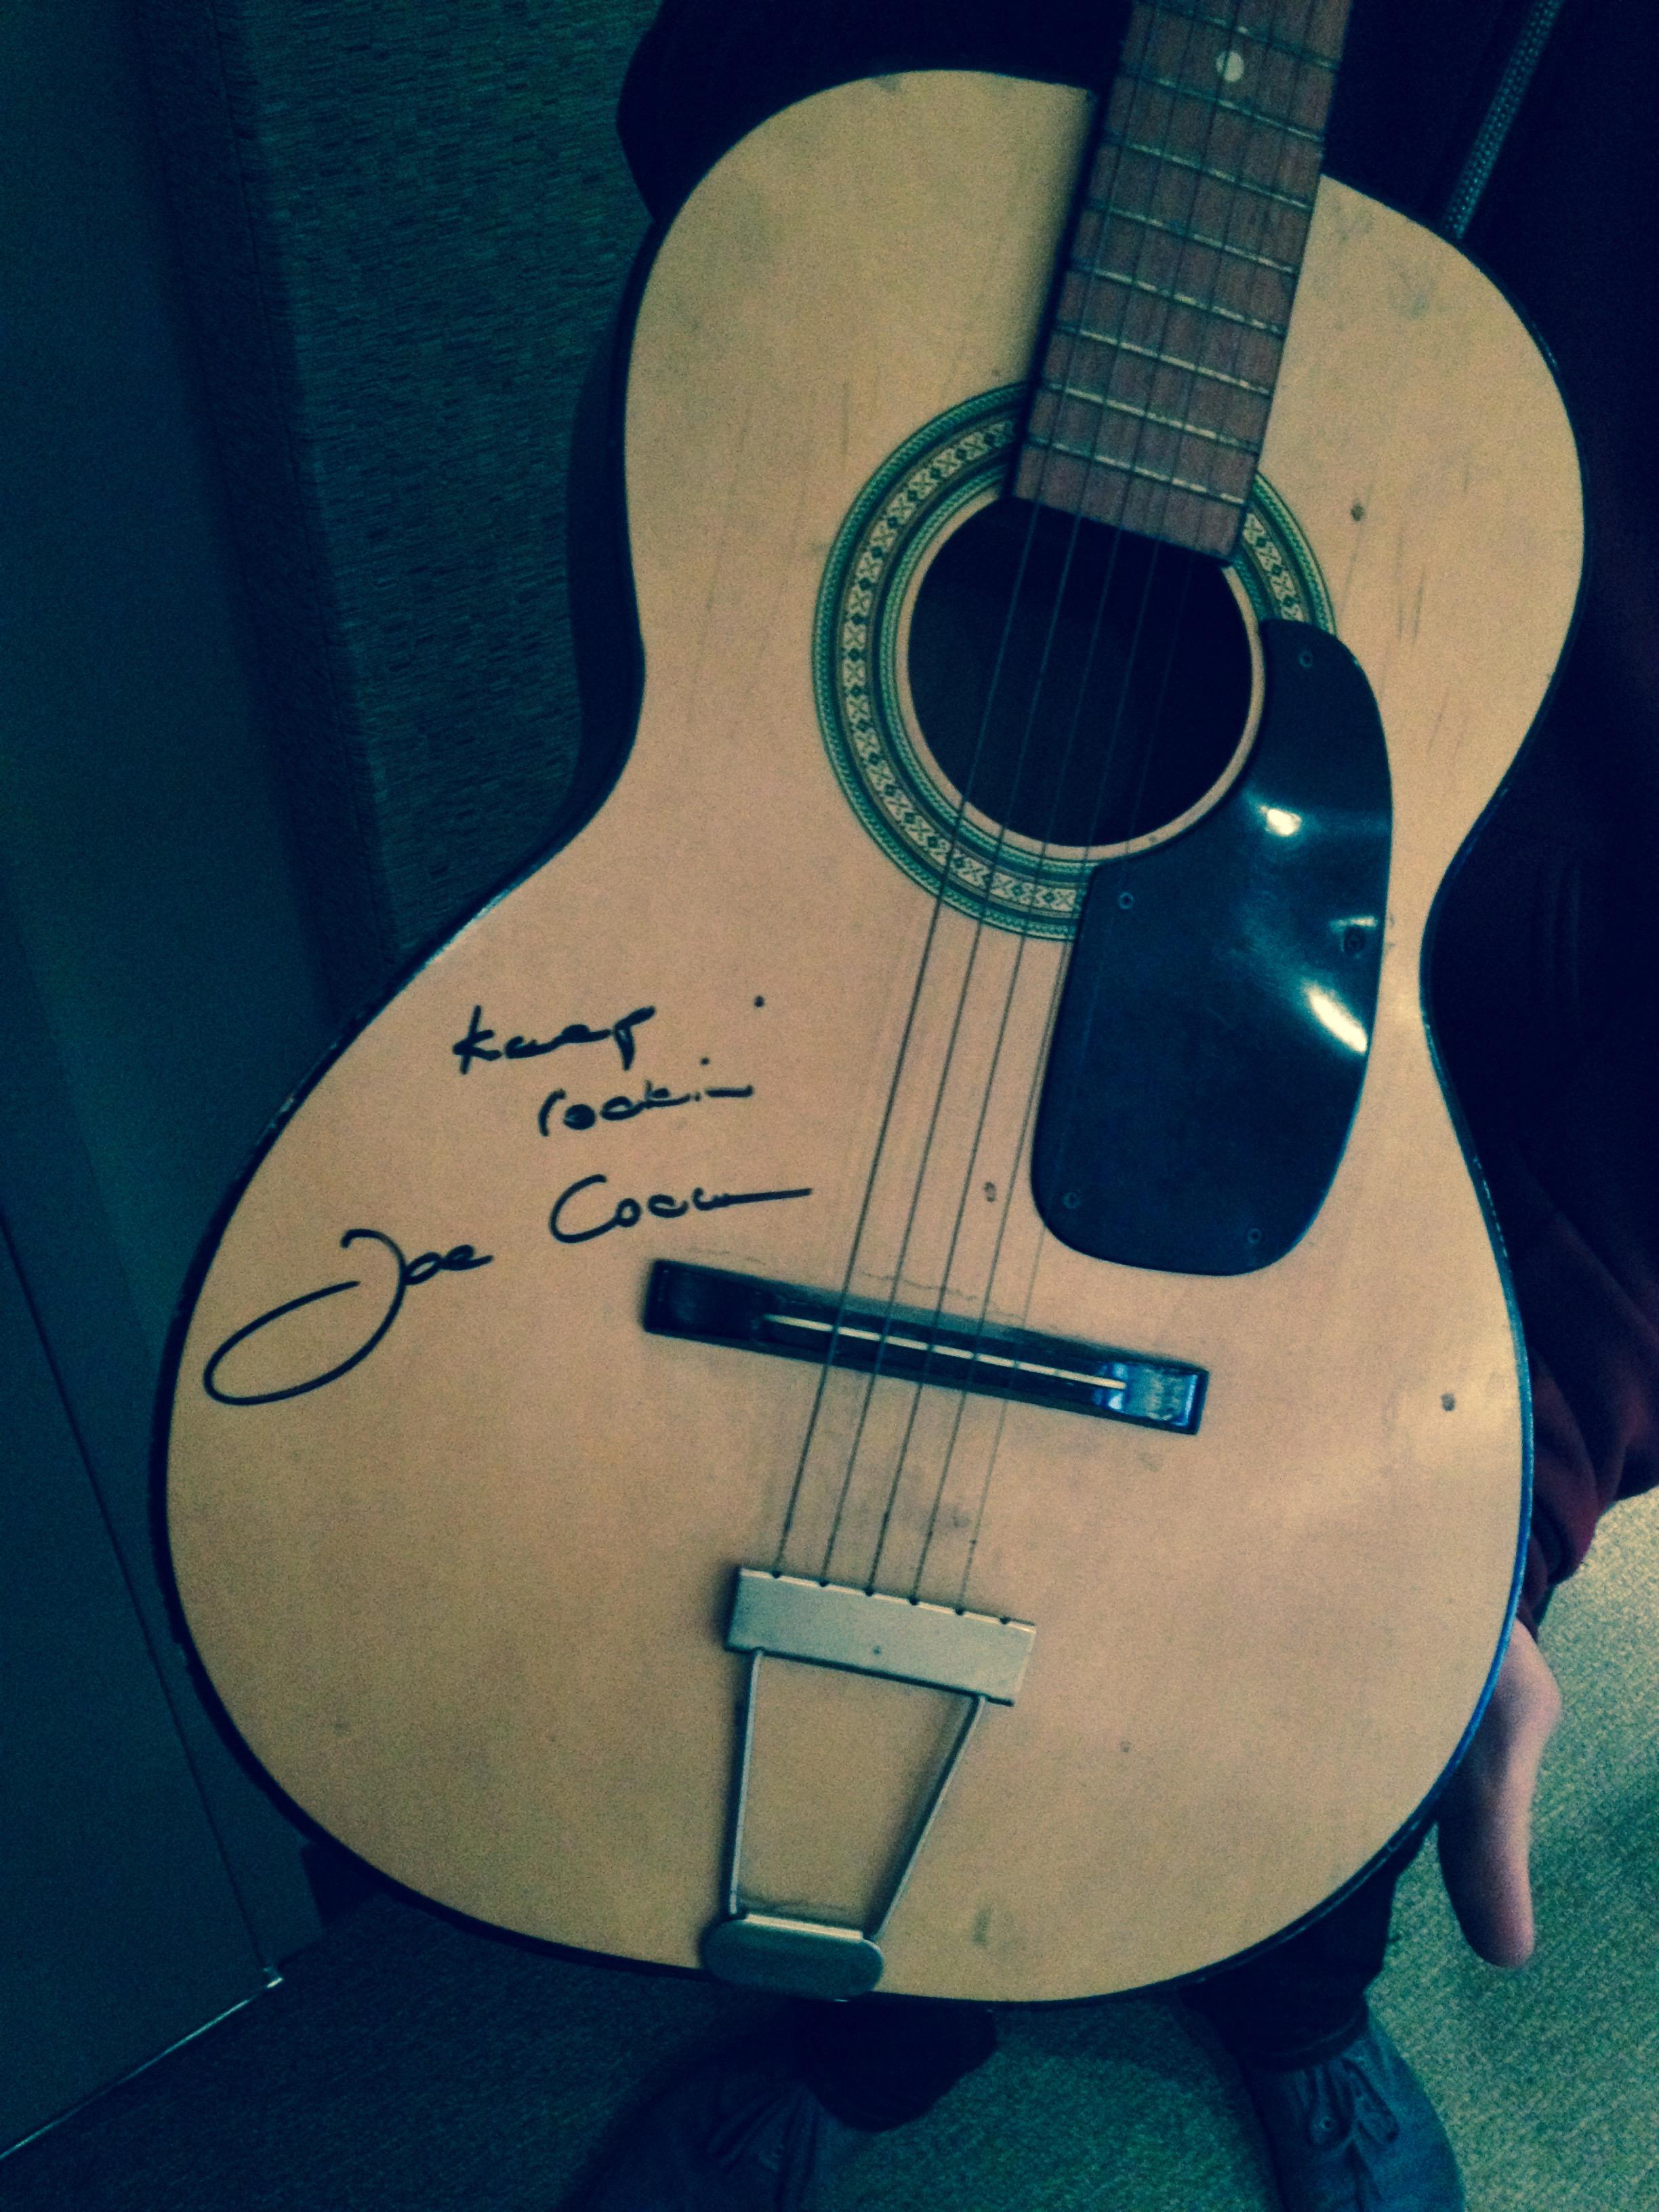 Photo: Joe Cocker signed guitar